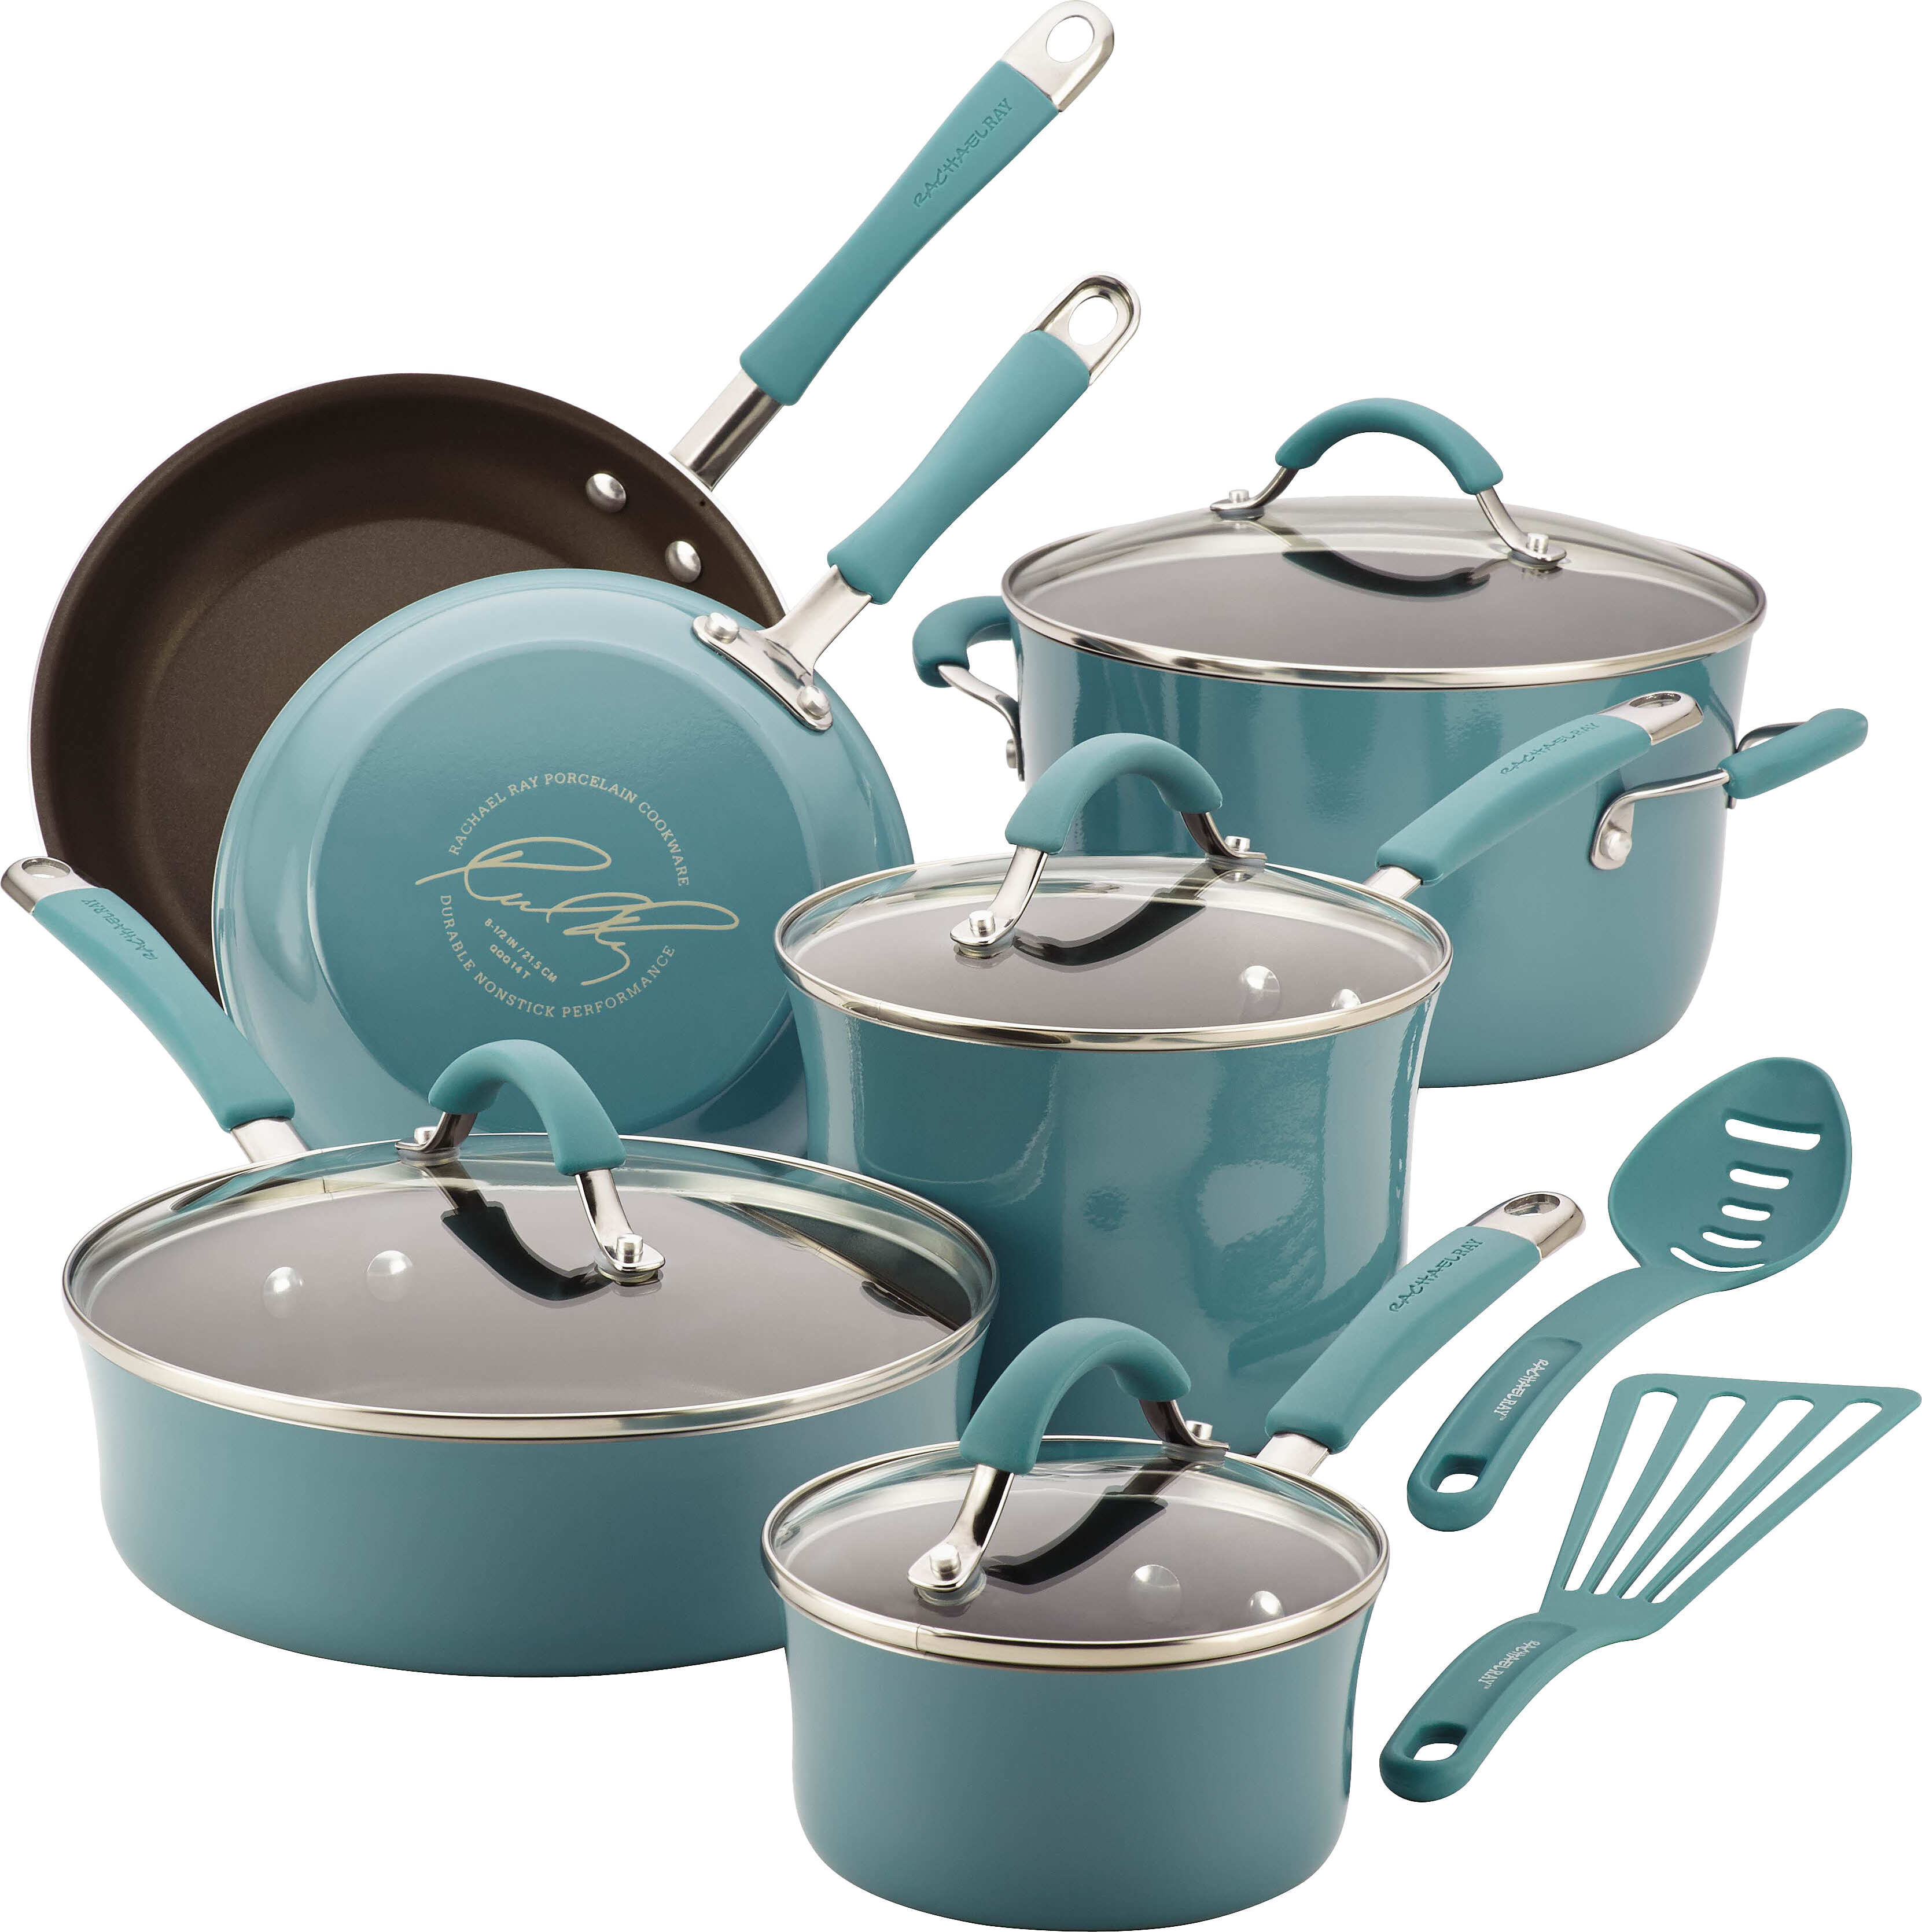 Rachael Ray Cucina 12 Piece Non- Stick Cookware Set & Reviews | Wayfair